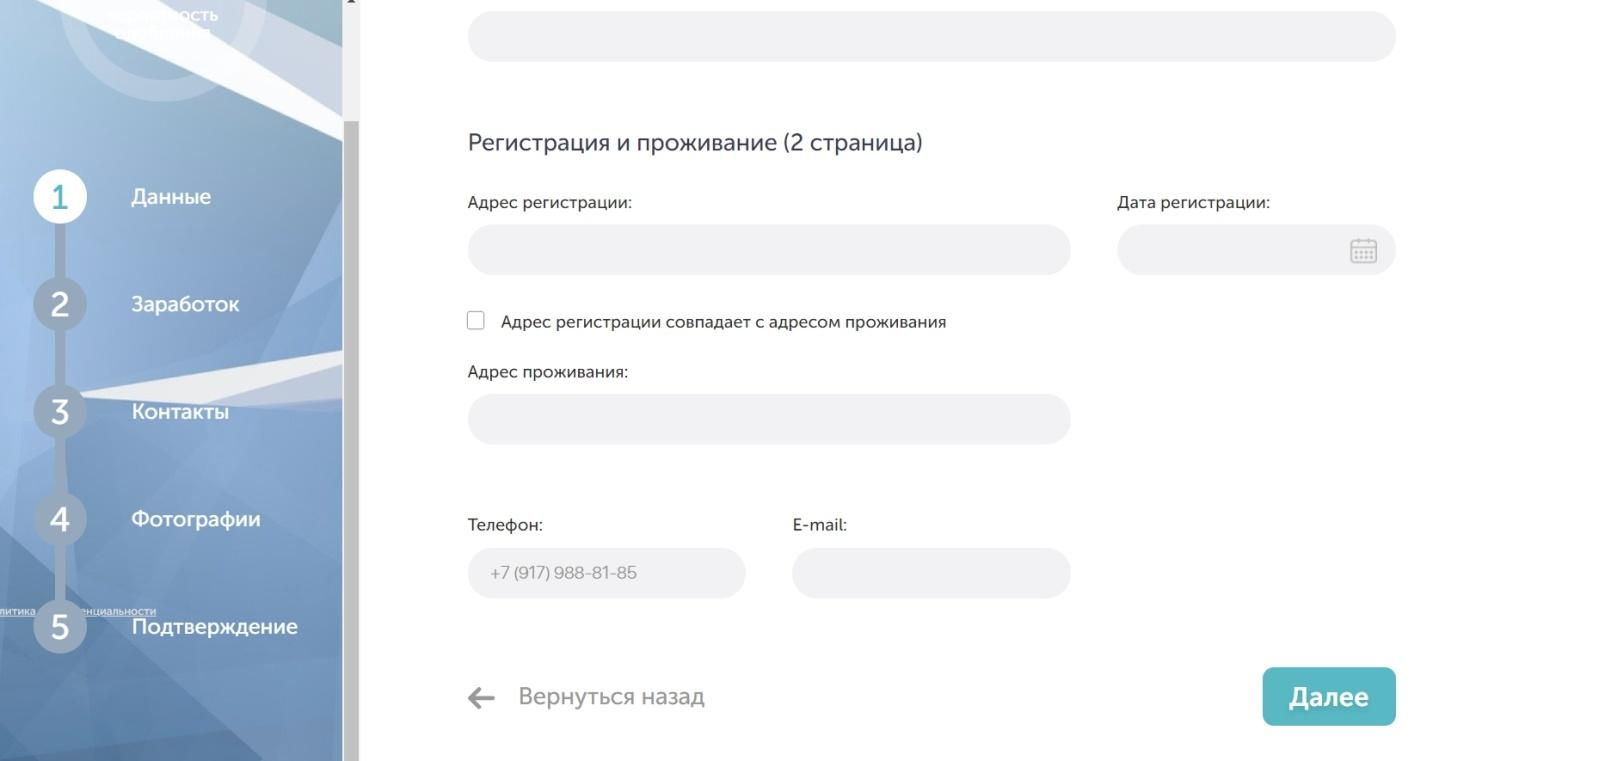 C:\Users\Лена\Desktop\Скриншот (07.10.2020 14-02-48).jpg